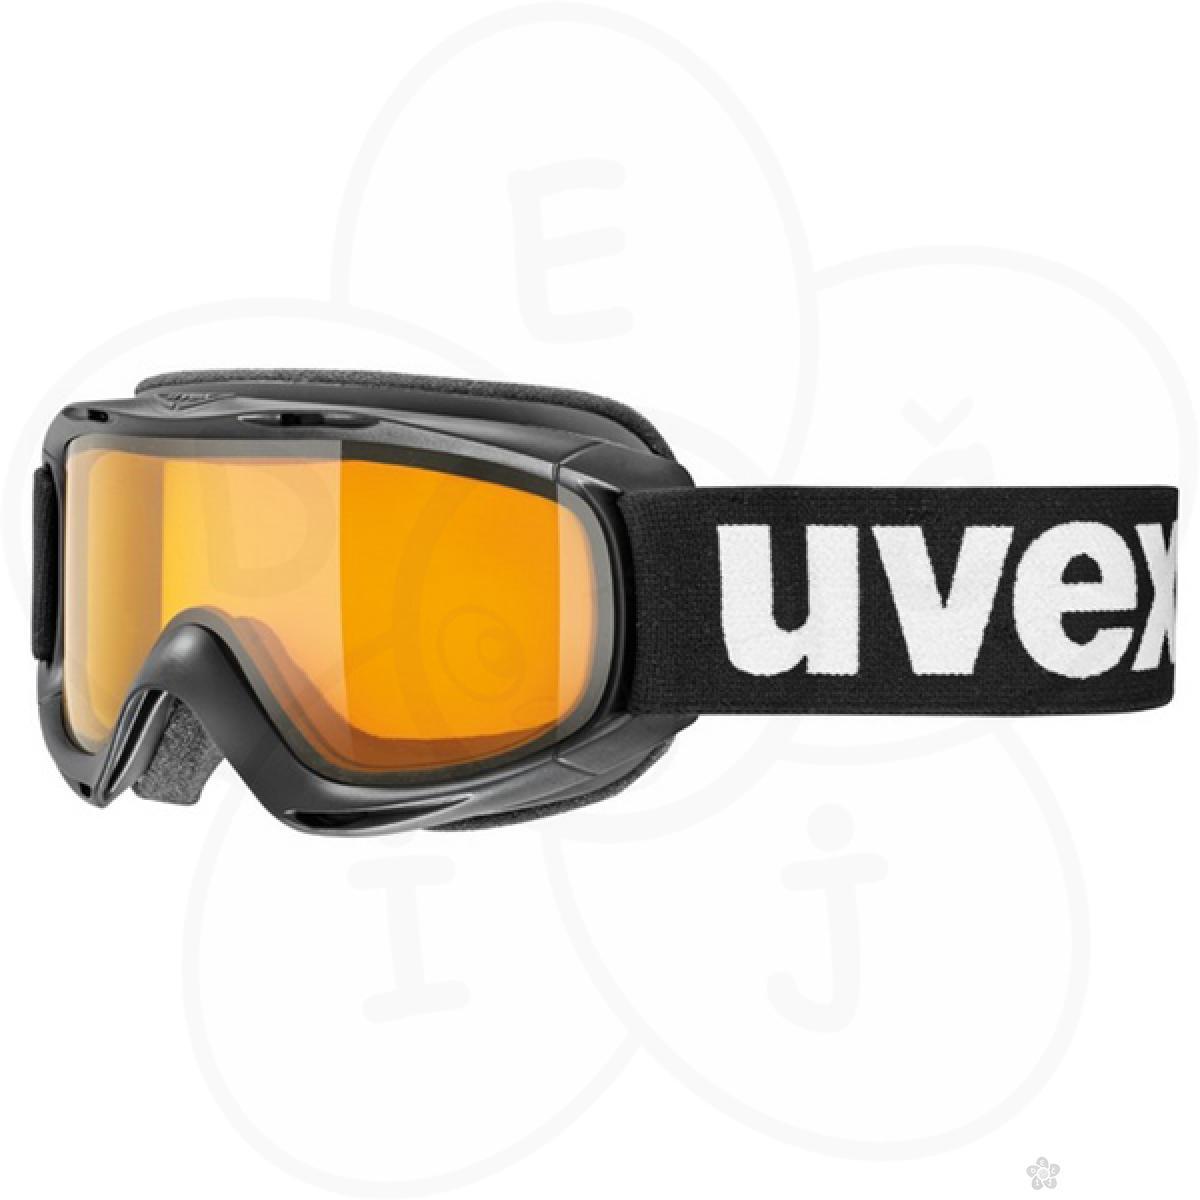 Naočare za skijanje UVEX SLIDER black-lasergold lite, SKI-S5500242129